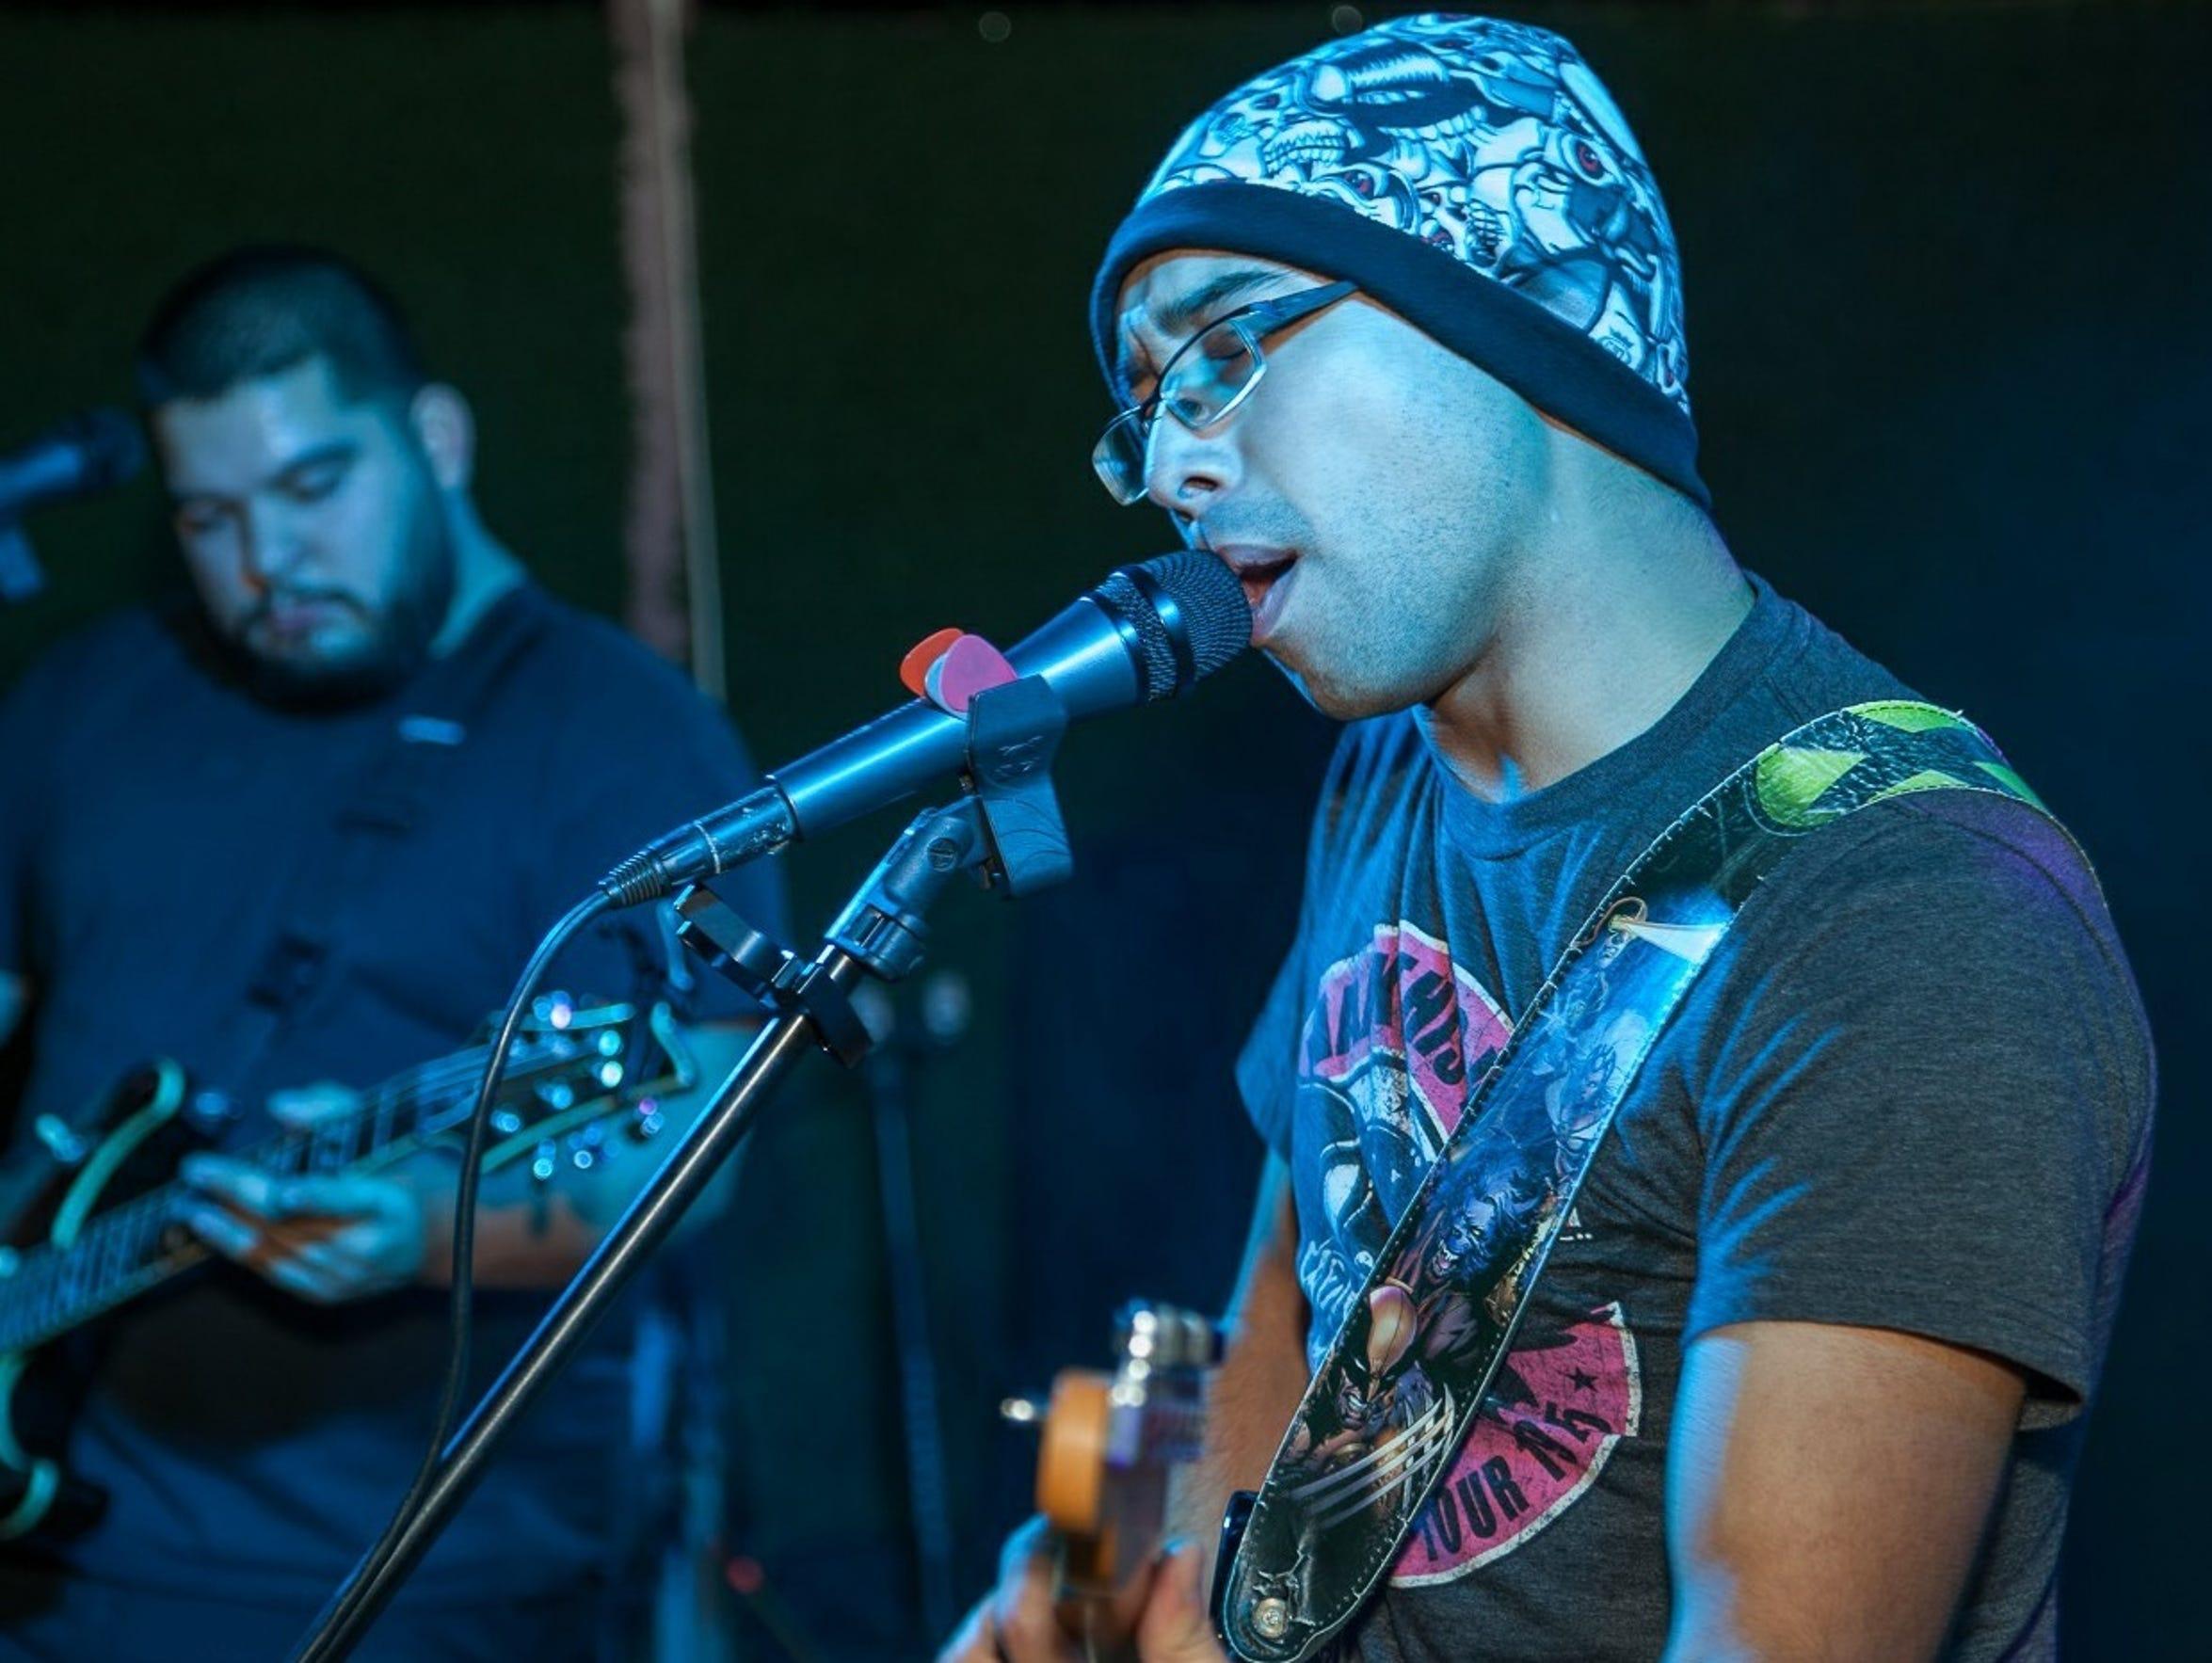 Perfect On Paper will perform 7 to 9 p.m. Saturday, Nov. 25 at Salud! de Mesilla.